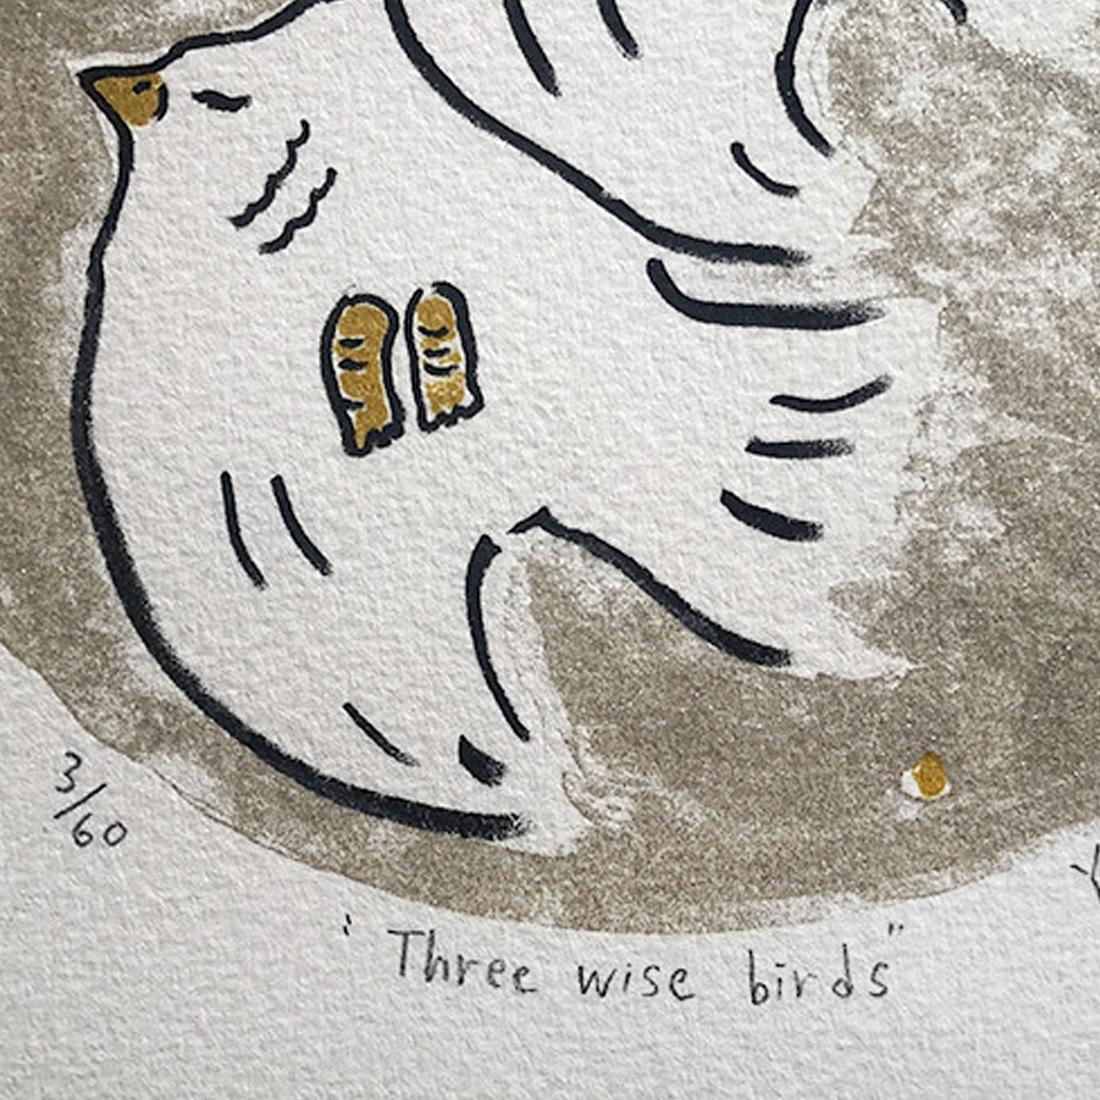 作品「Three wise birds」